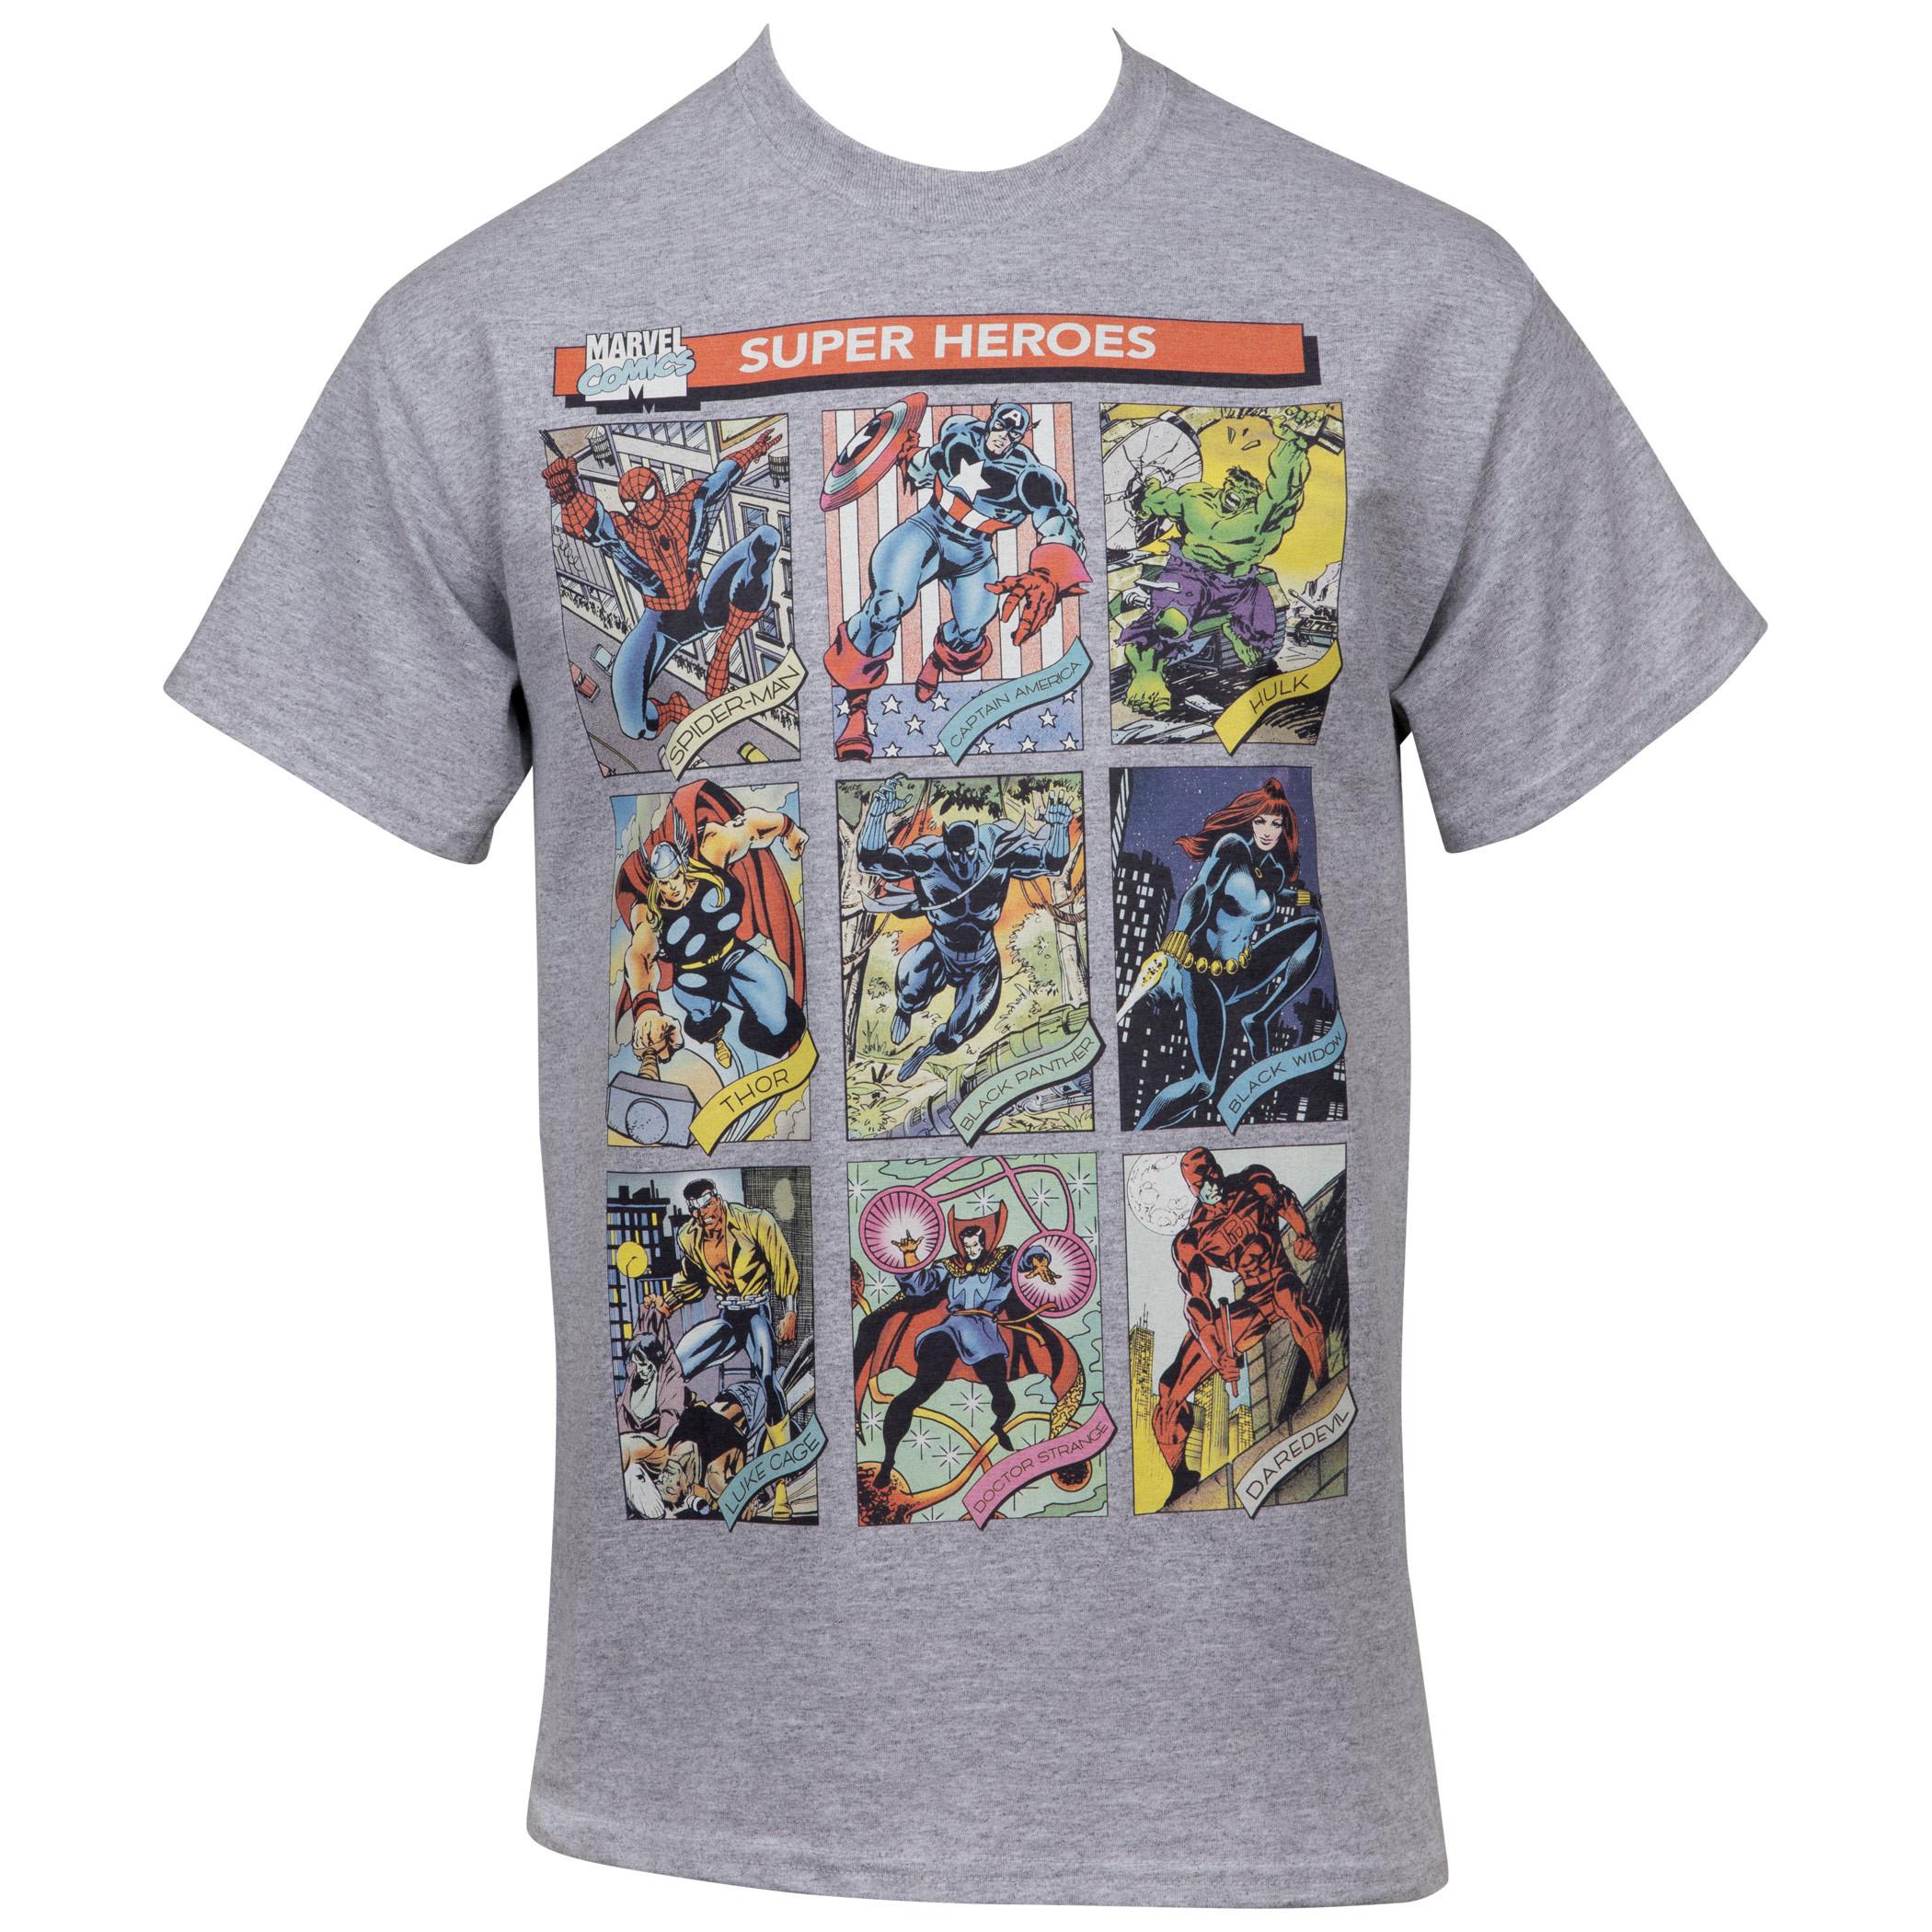 Marvel The Avengers Hero Trading Card Images T-shirt